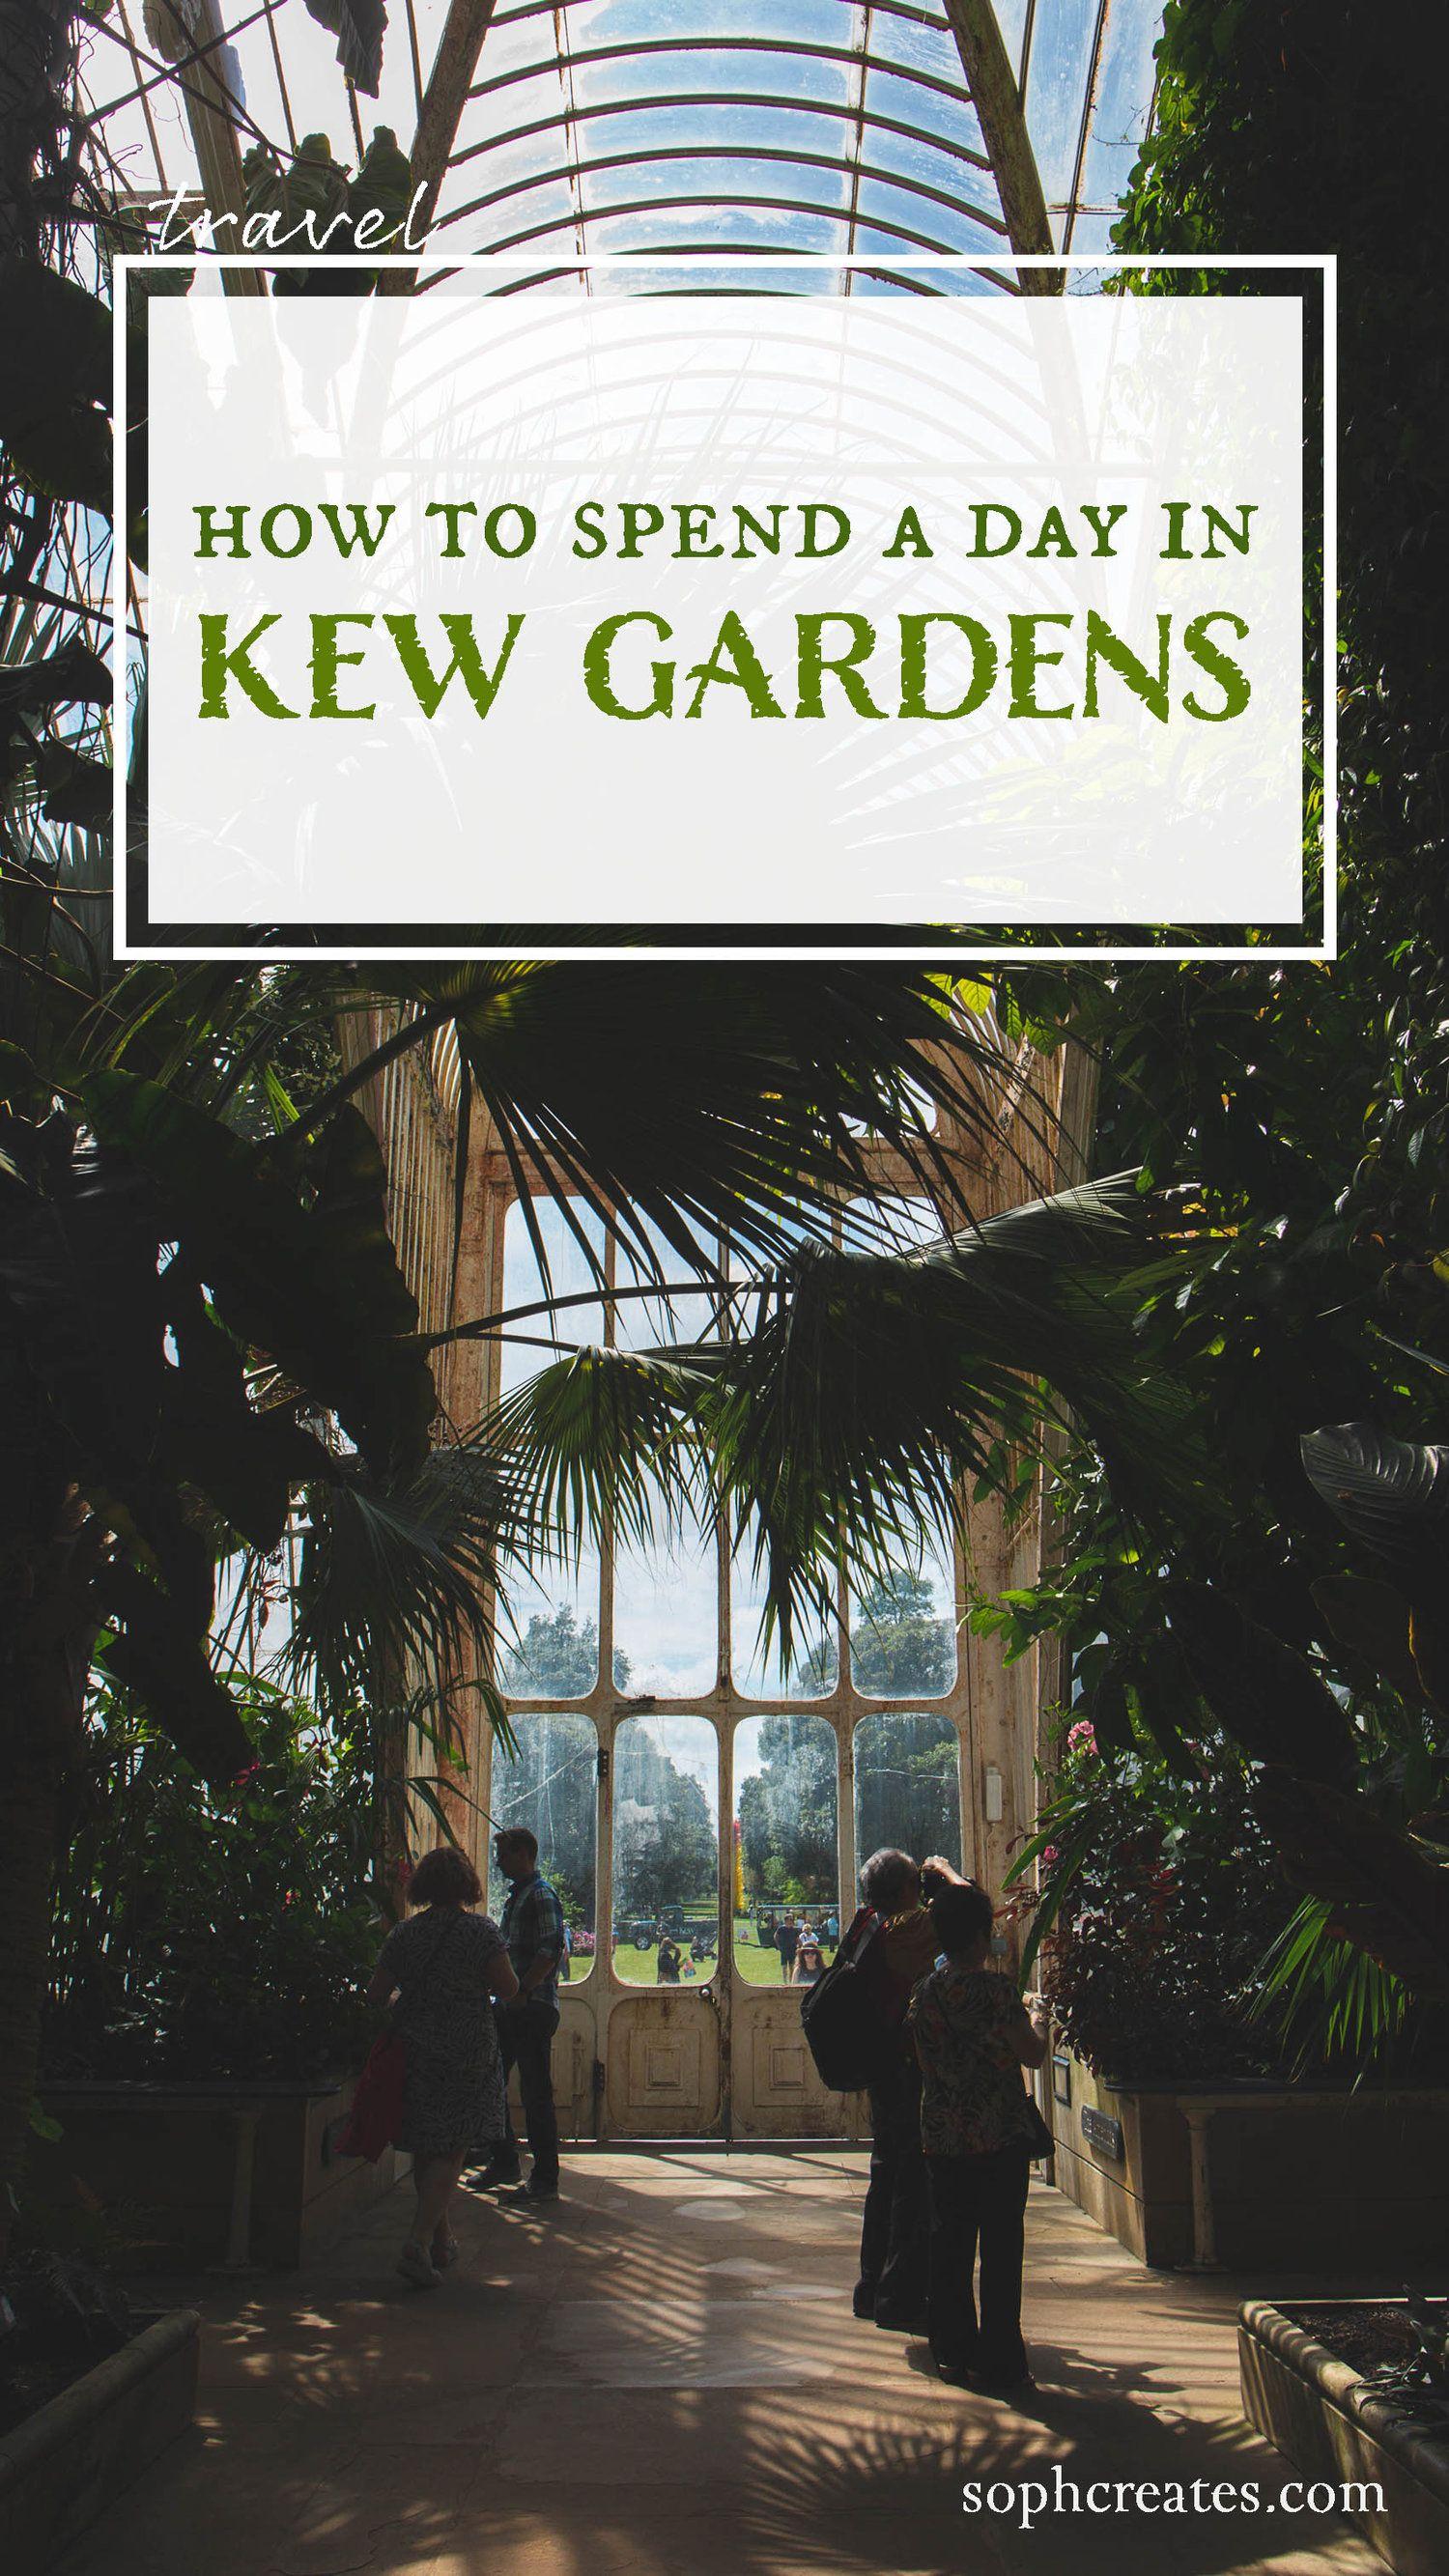 eaad445c4bfd5bdf86ae8c9f45f89798 - Best Places To Stay Near Kew Gardens